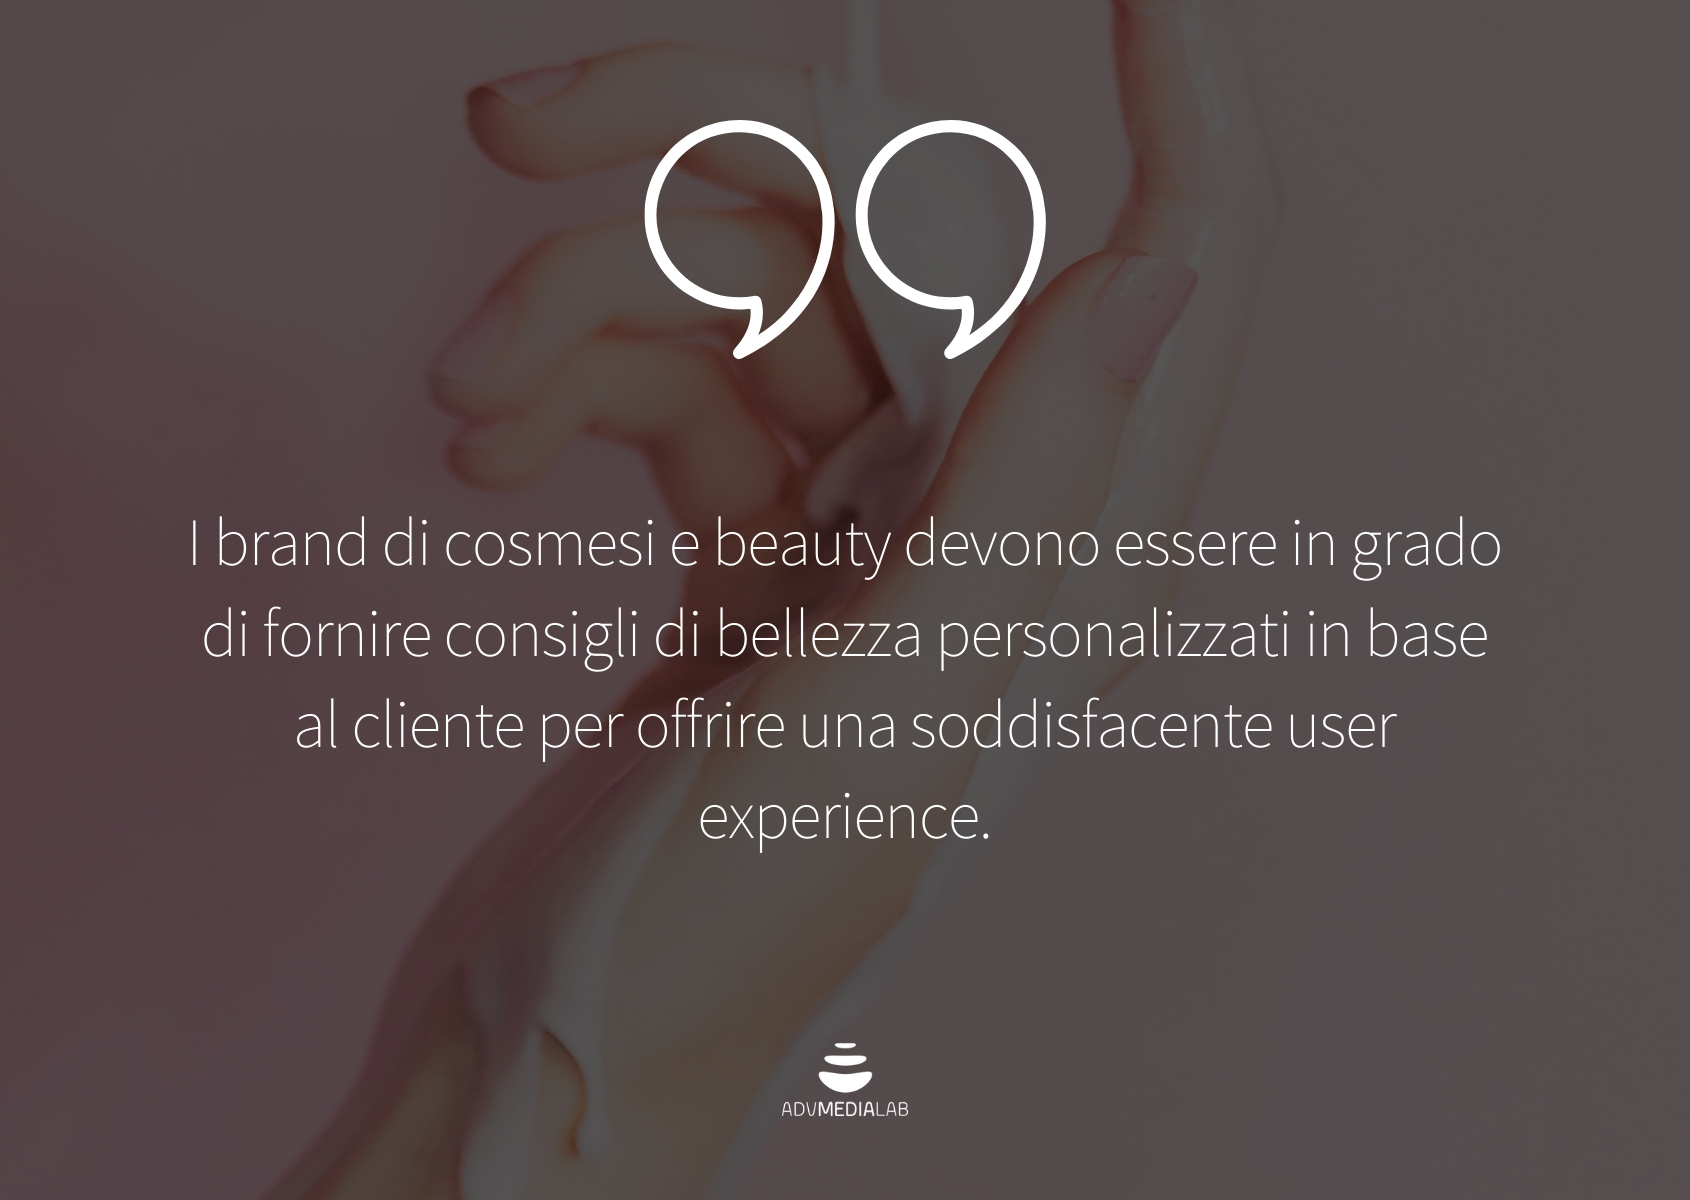 UX-beauty-cosmesi-quote6